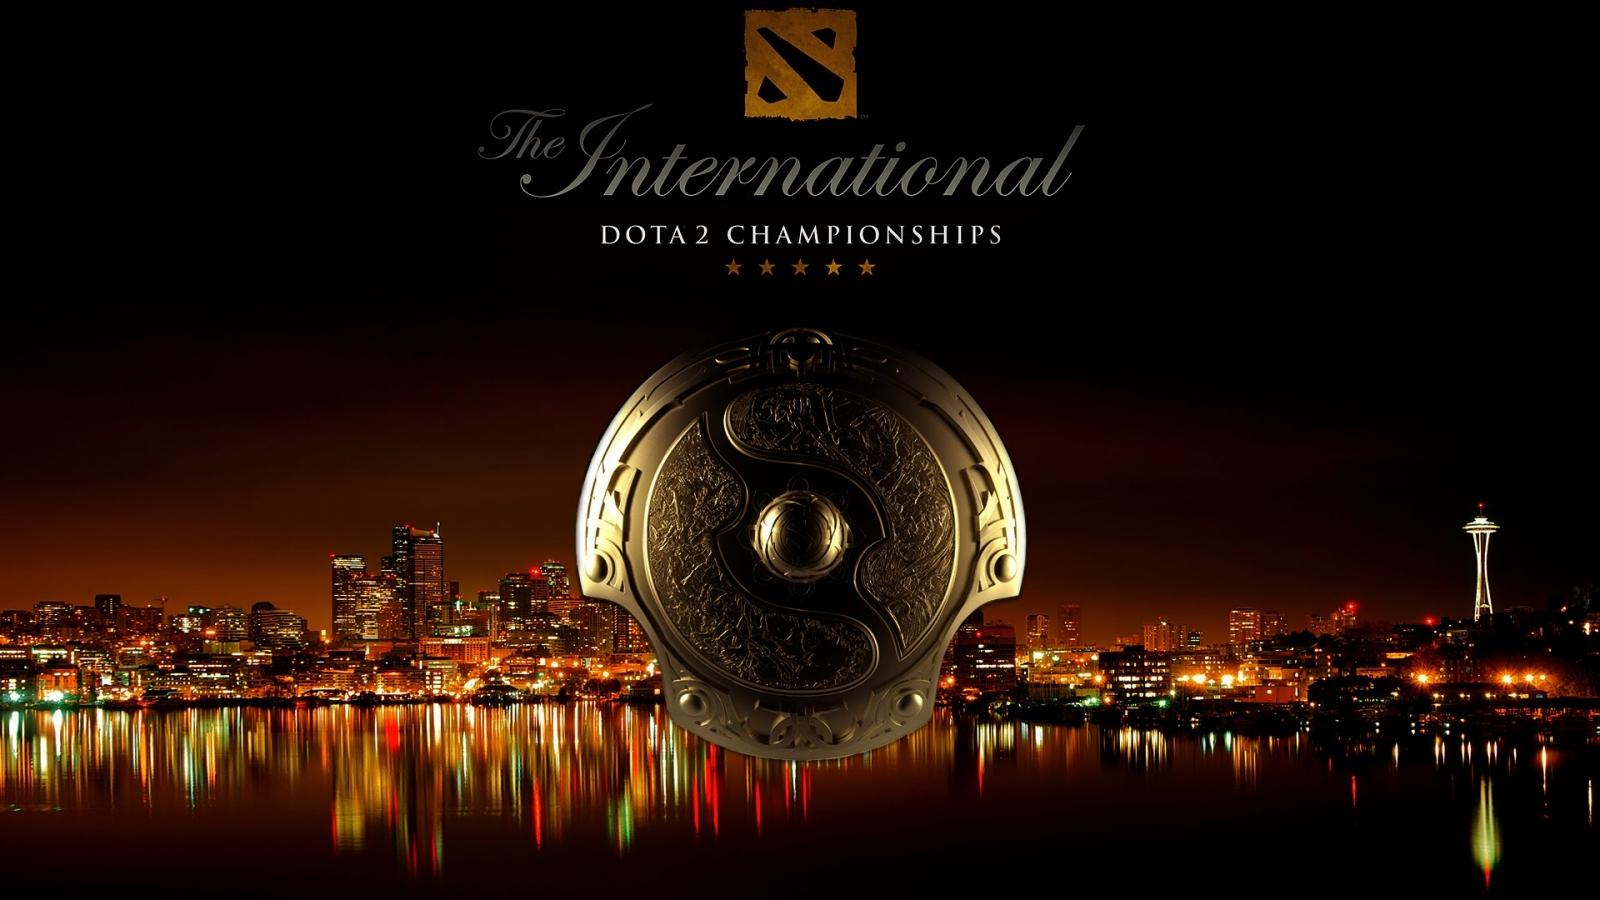 Dota 2 International 2015 Championships